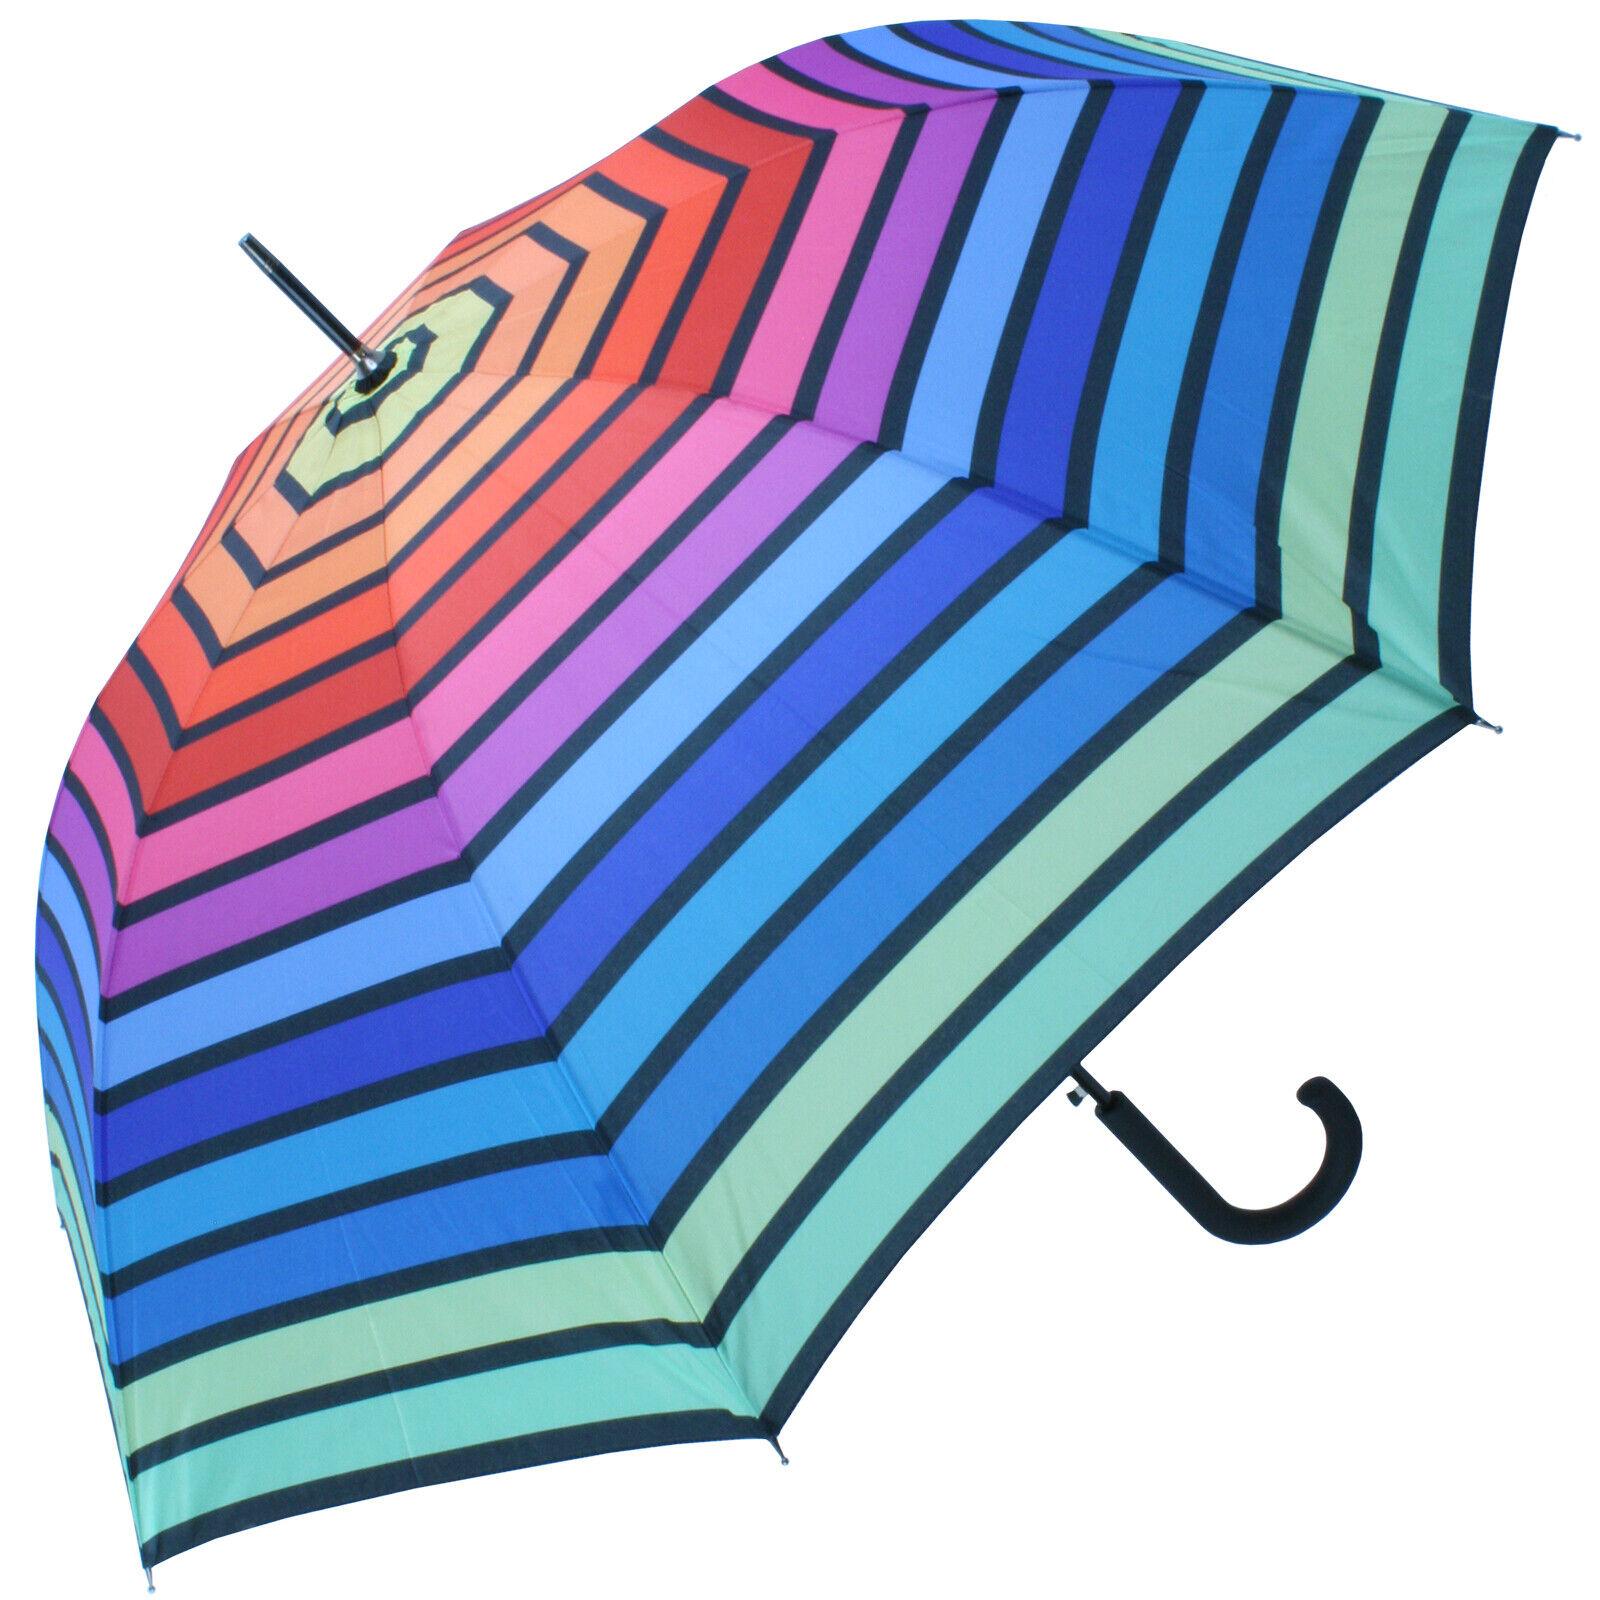 Horizontal Rainbow Walking Length Umbrella by Soake - Green Border